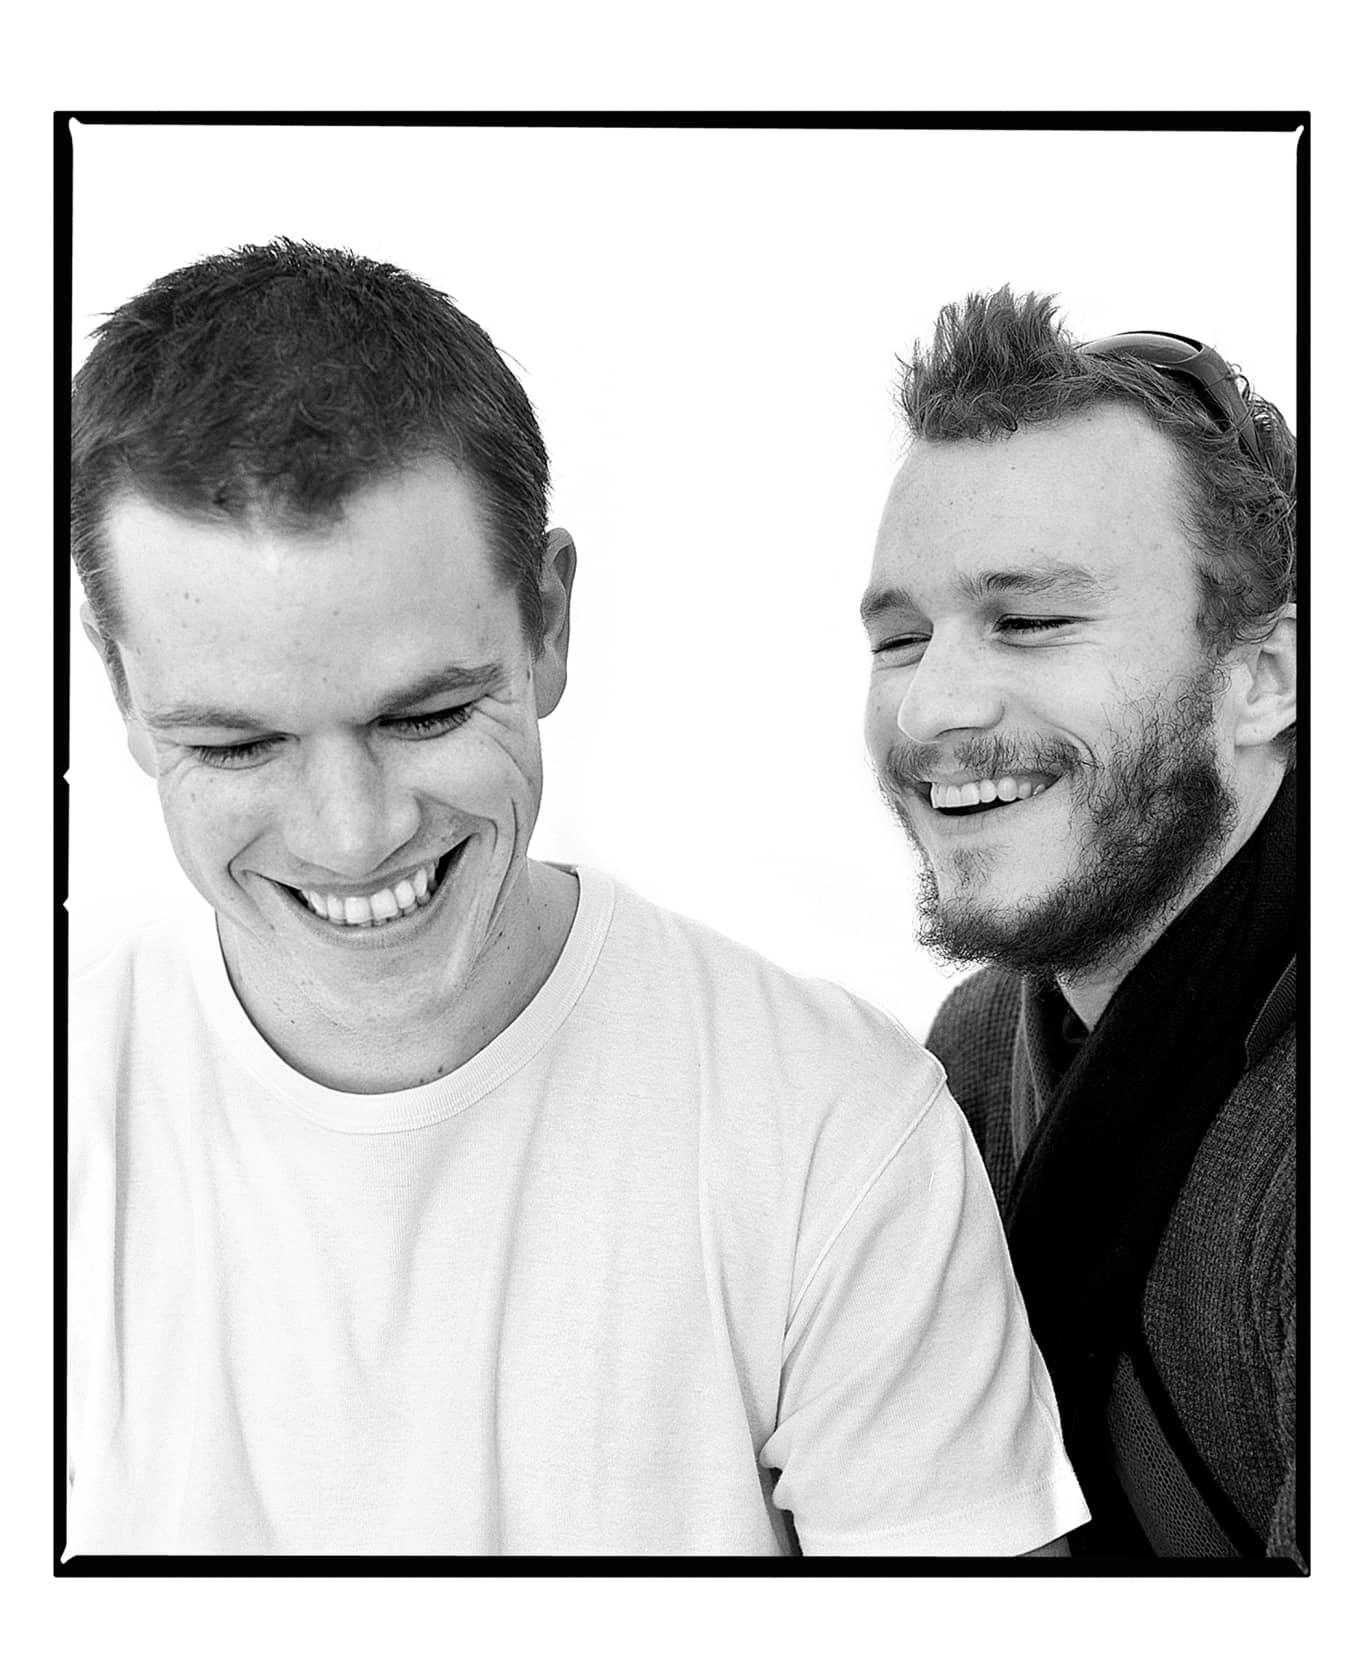 Andy Gotts Heath Ledger and Matt Damon Fine Art Giclée Archival Print